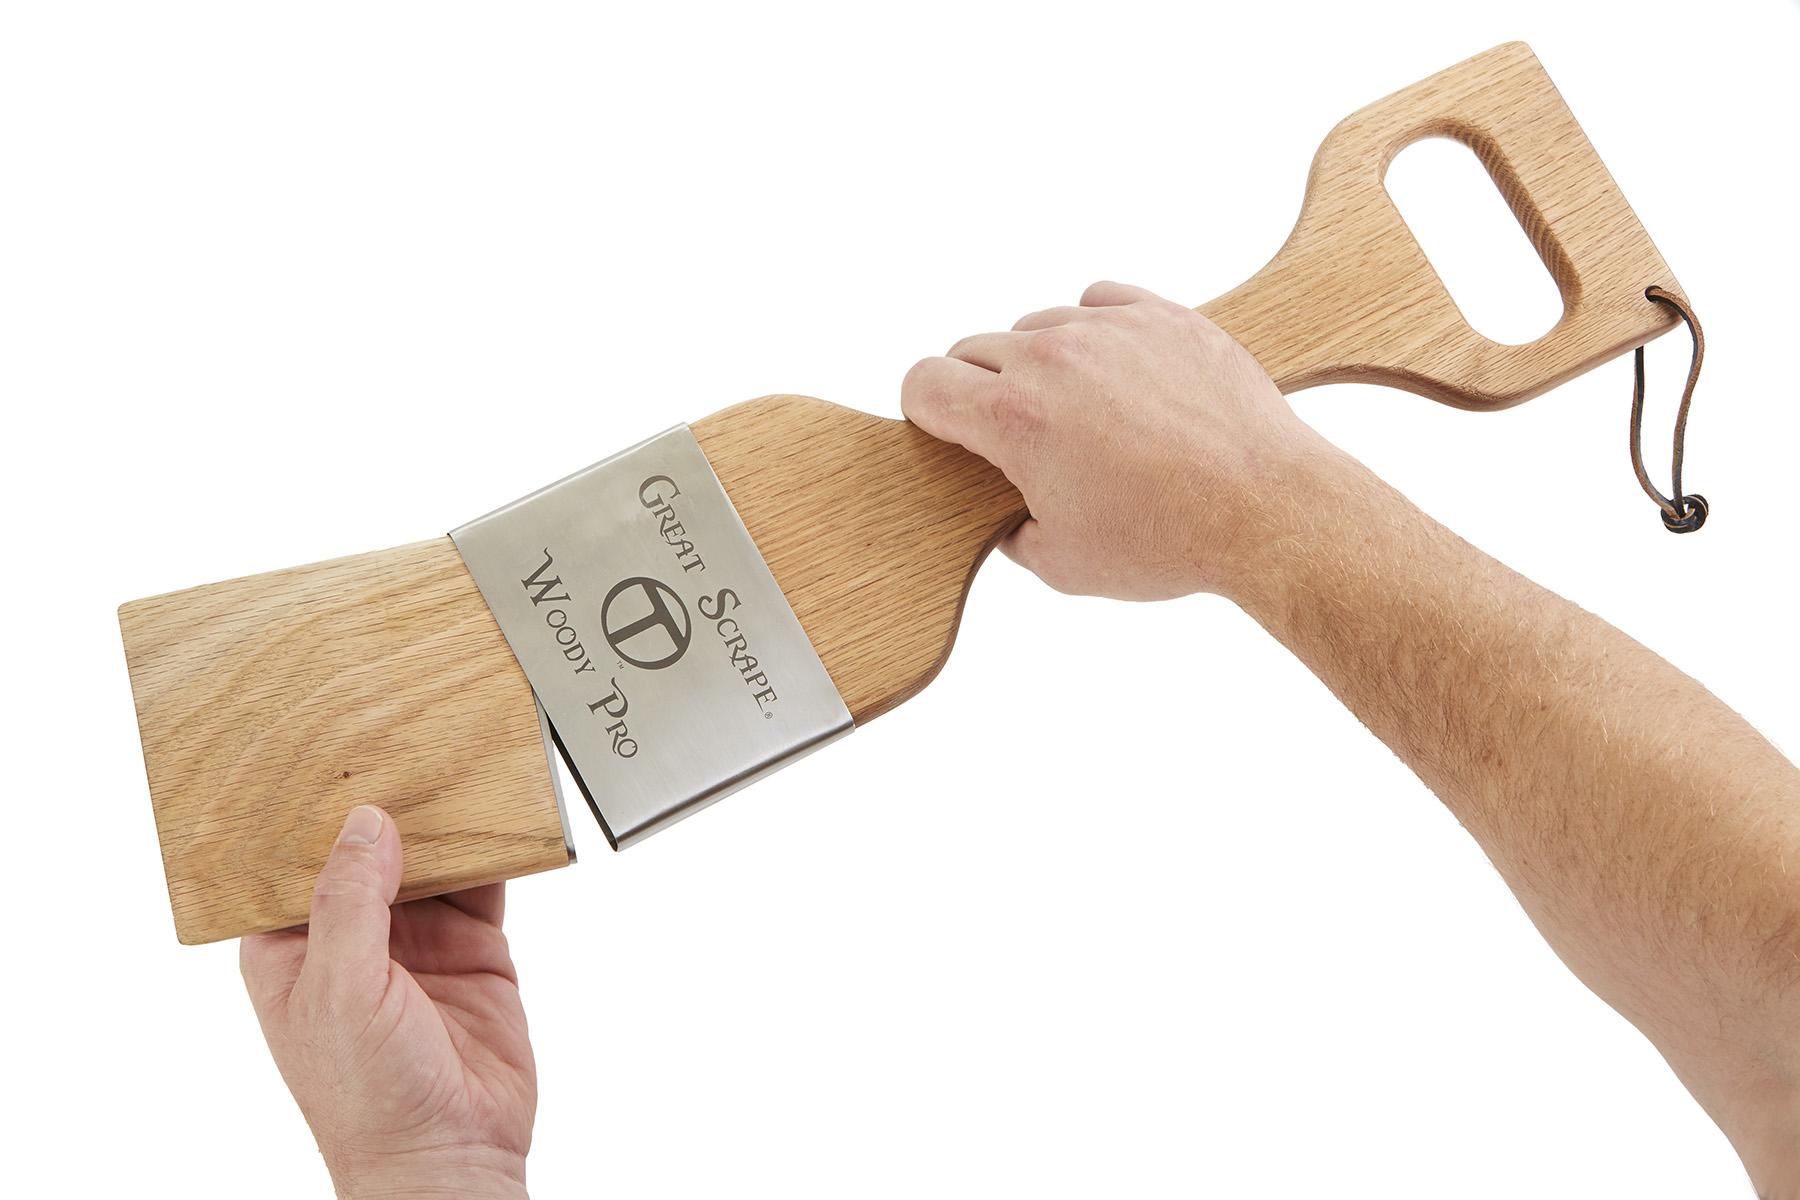 Pro tip removed hands-29846 RET 4x6